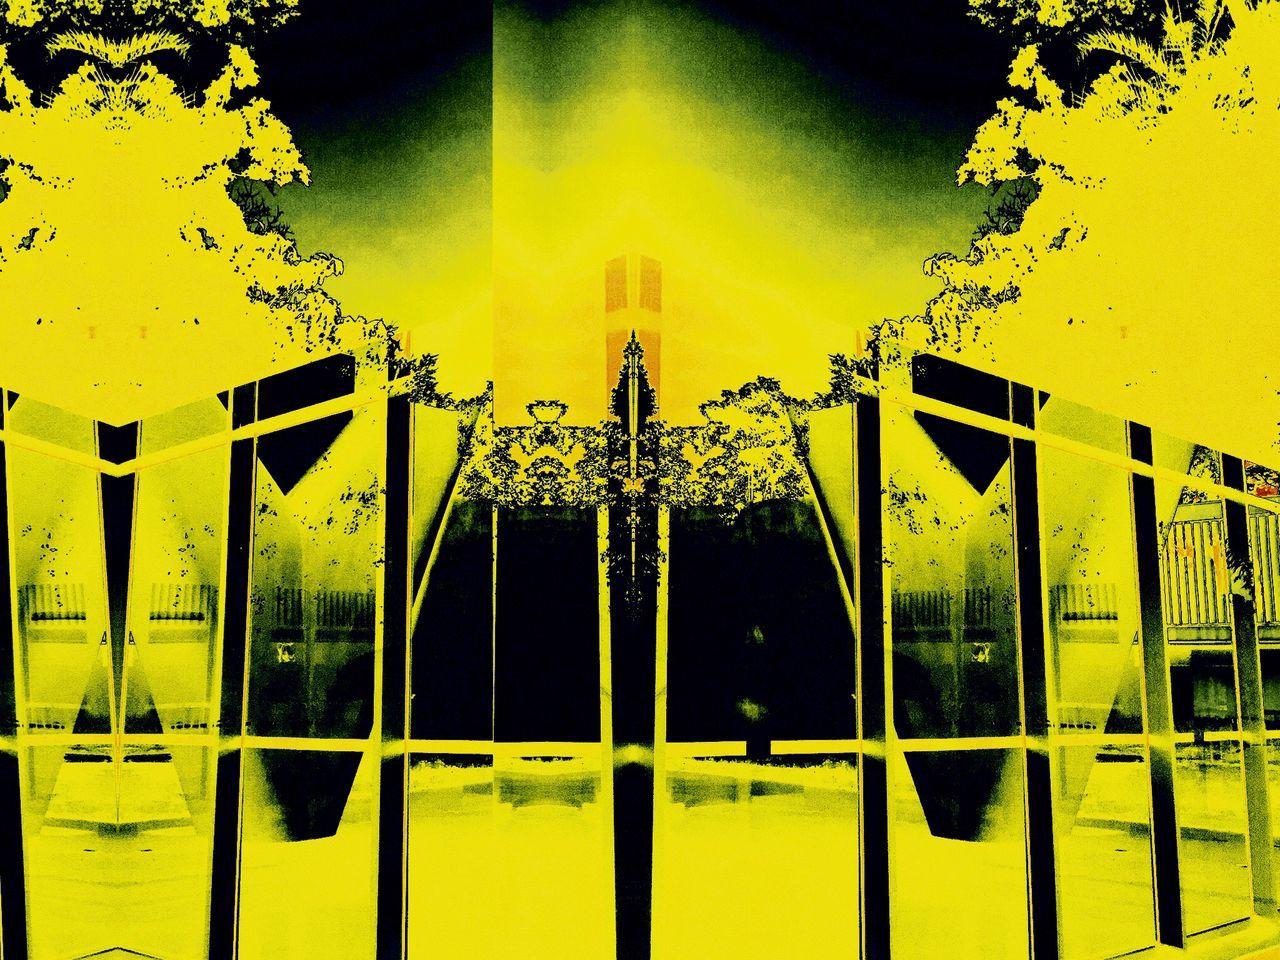 Niemeyer Digital Art